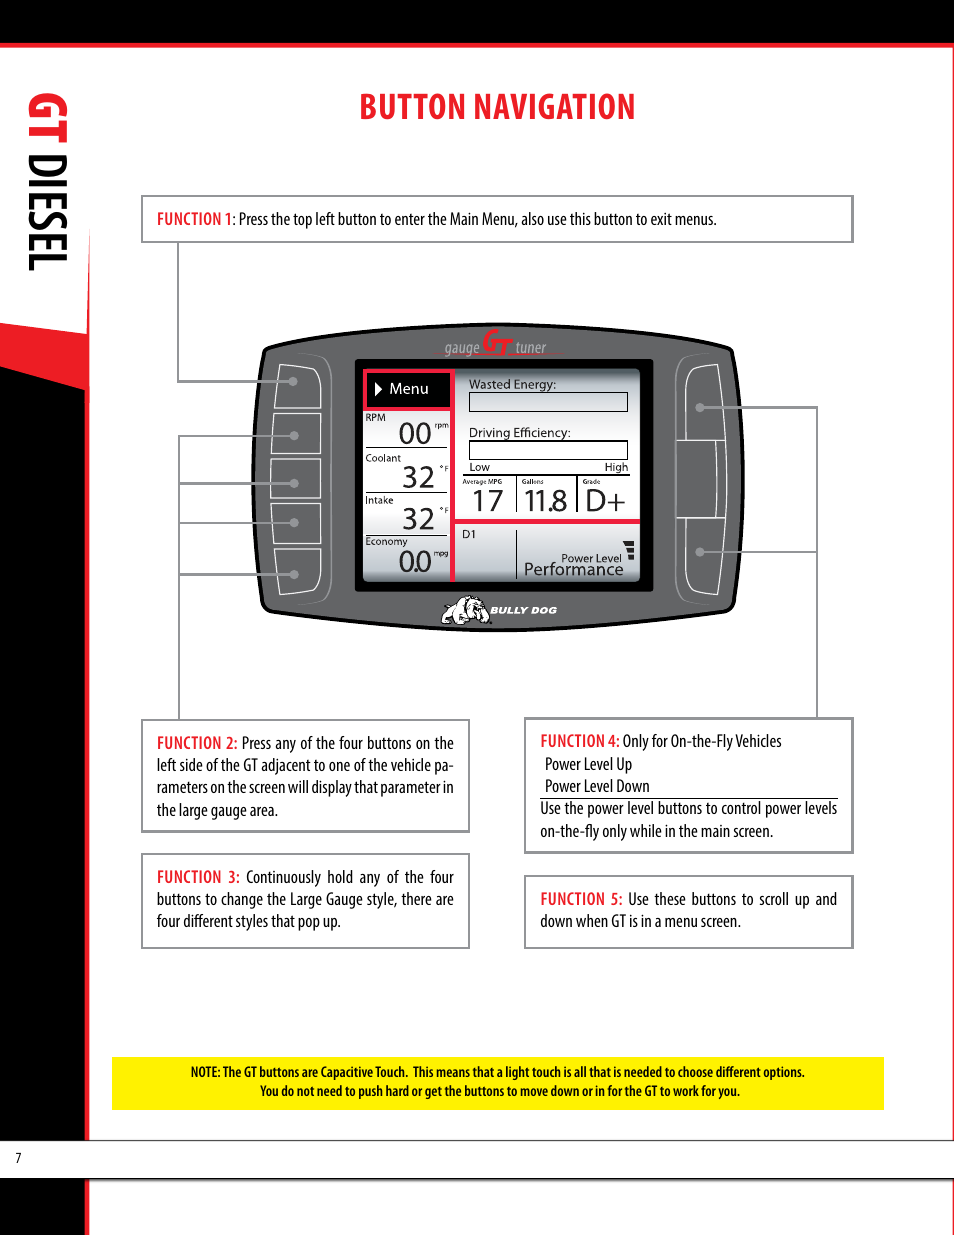 Bully Dog 40420 >> Gt diesel, Button navigation | Bully Dog 40420 gauge GT tuner User Manual | Page 8 / 54